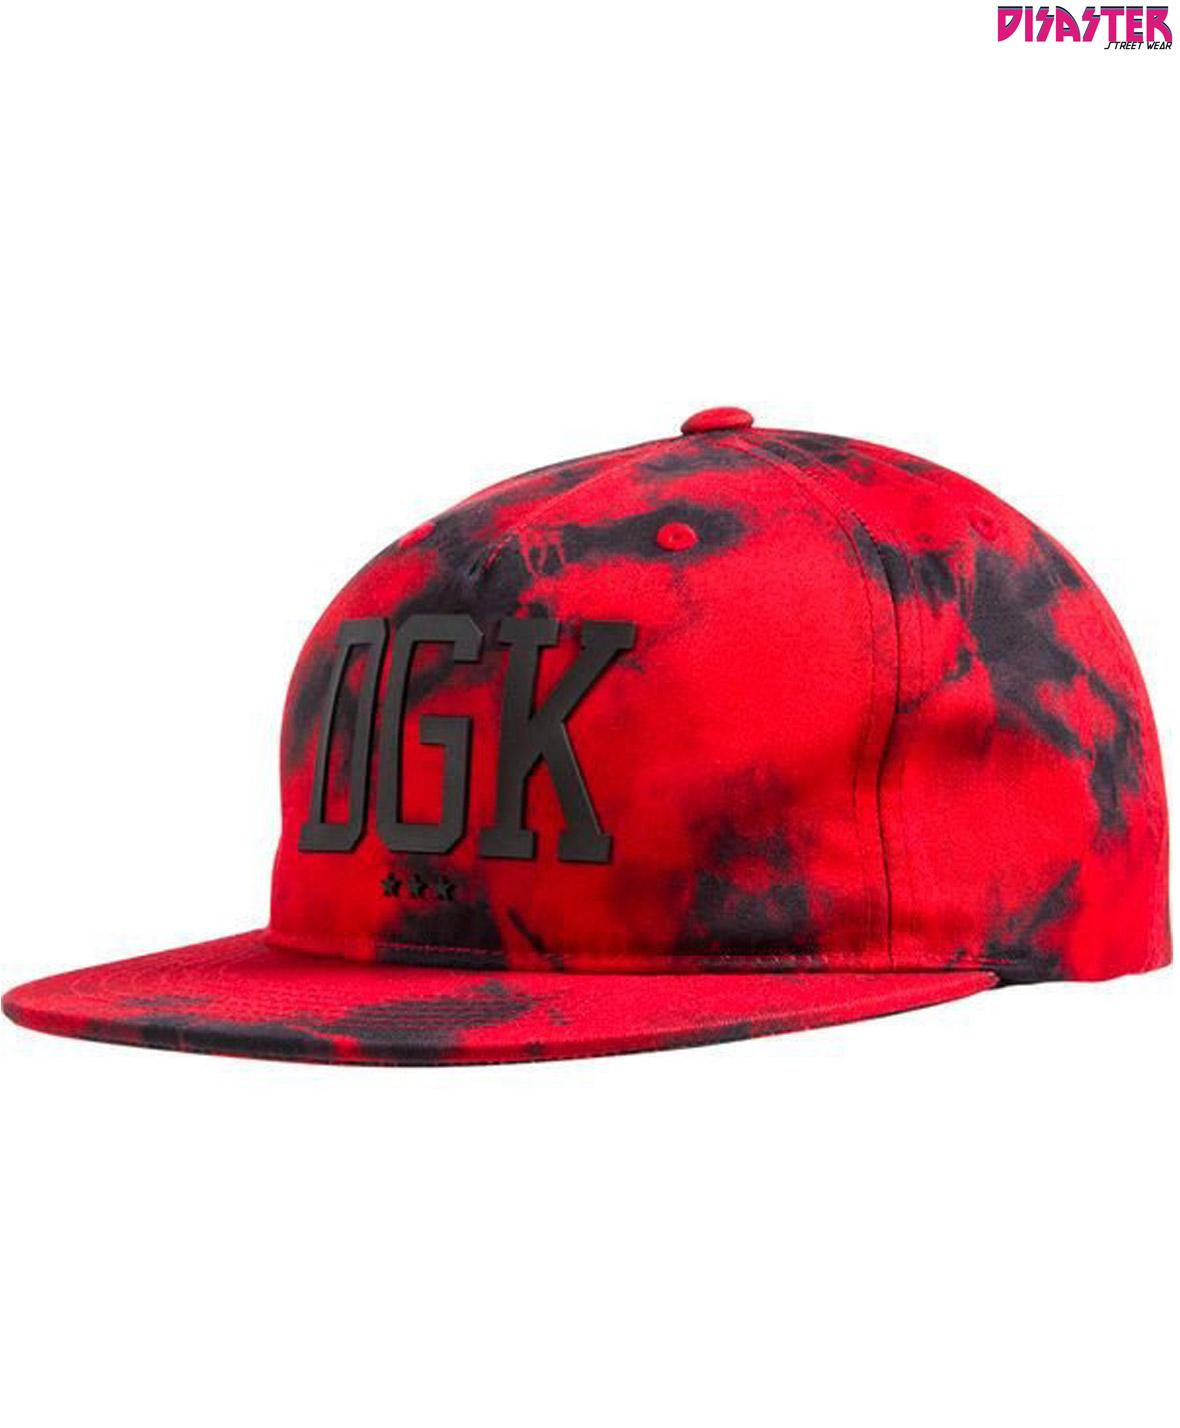 Gorra-DGK-Lava-snapback-visera-plana-malaga-disaster-street-wear-01 ... 90bb6d558a8